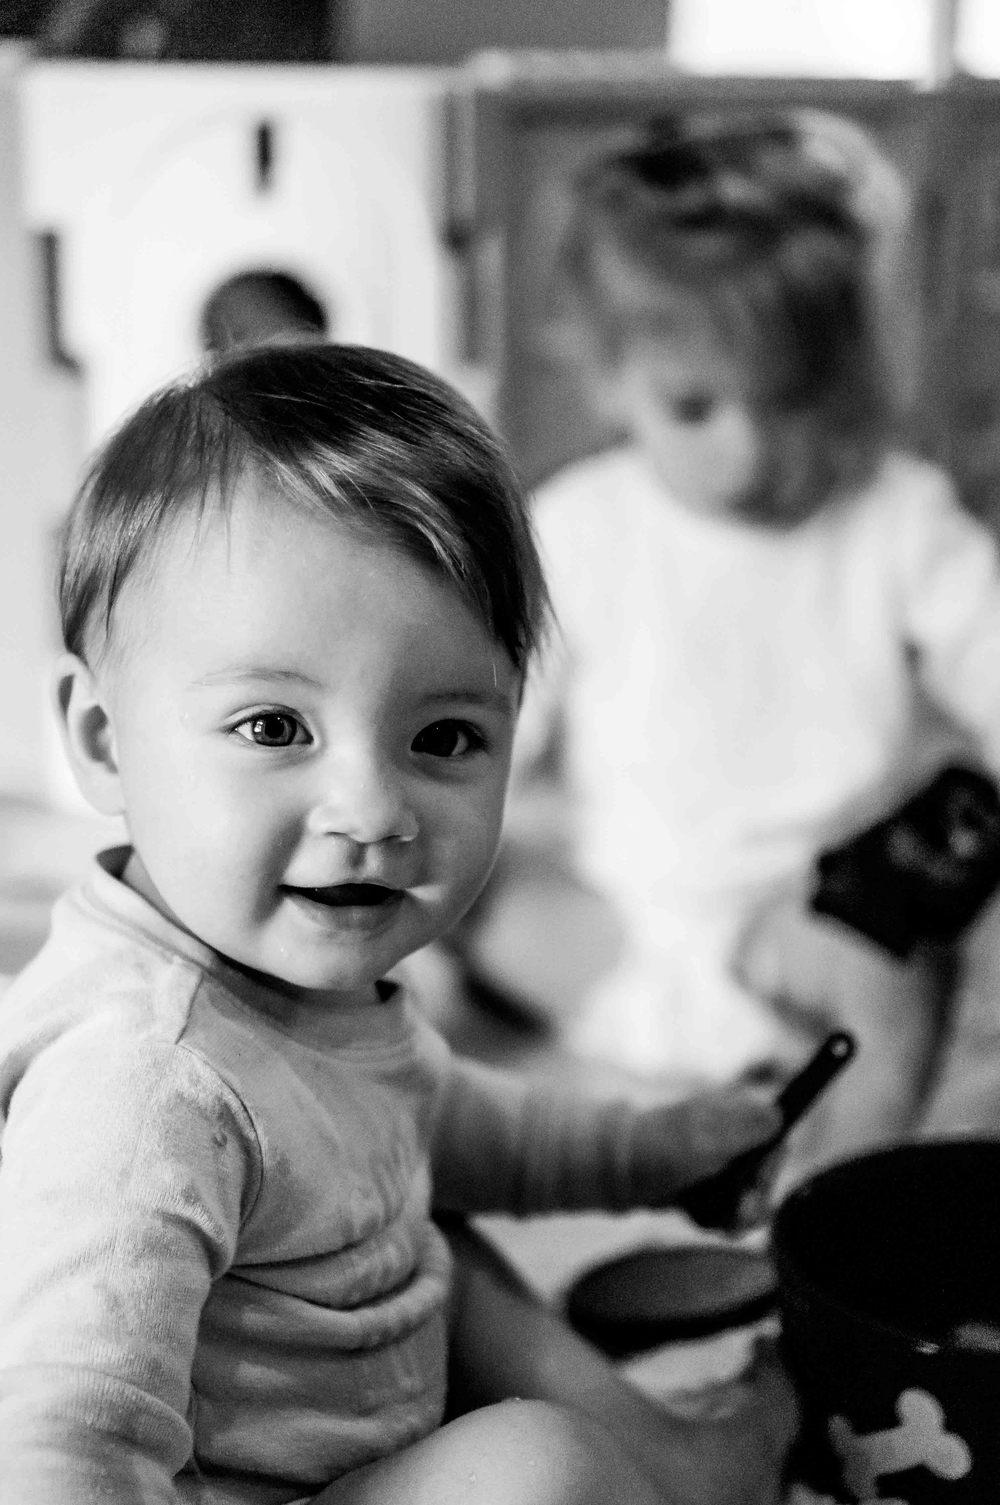 Littlest Little.